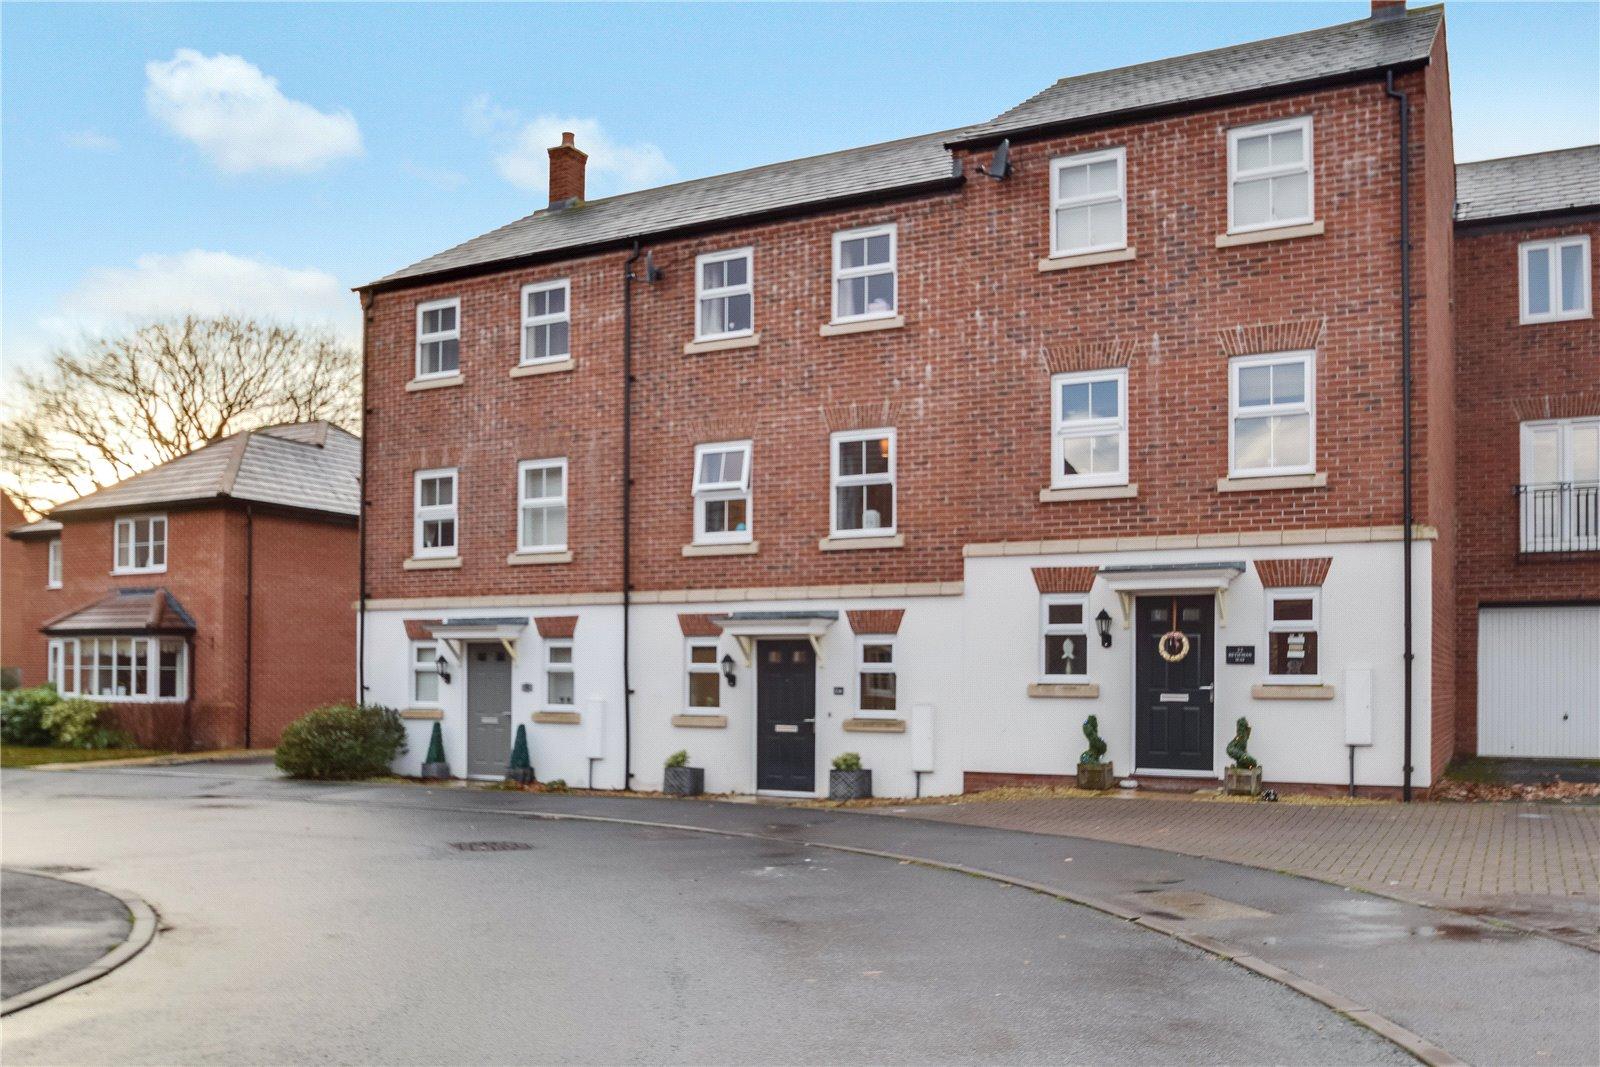 24 Betjeman Way, Cleobury Mortimer, Kidderminster, Shropshire, DY14